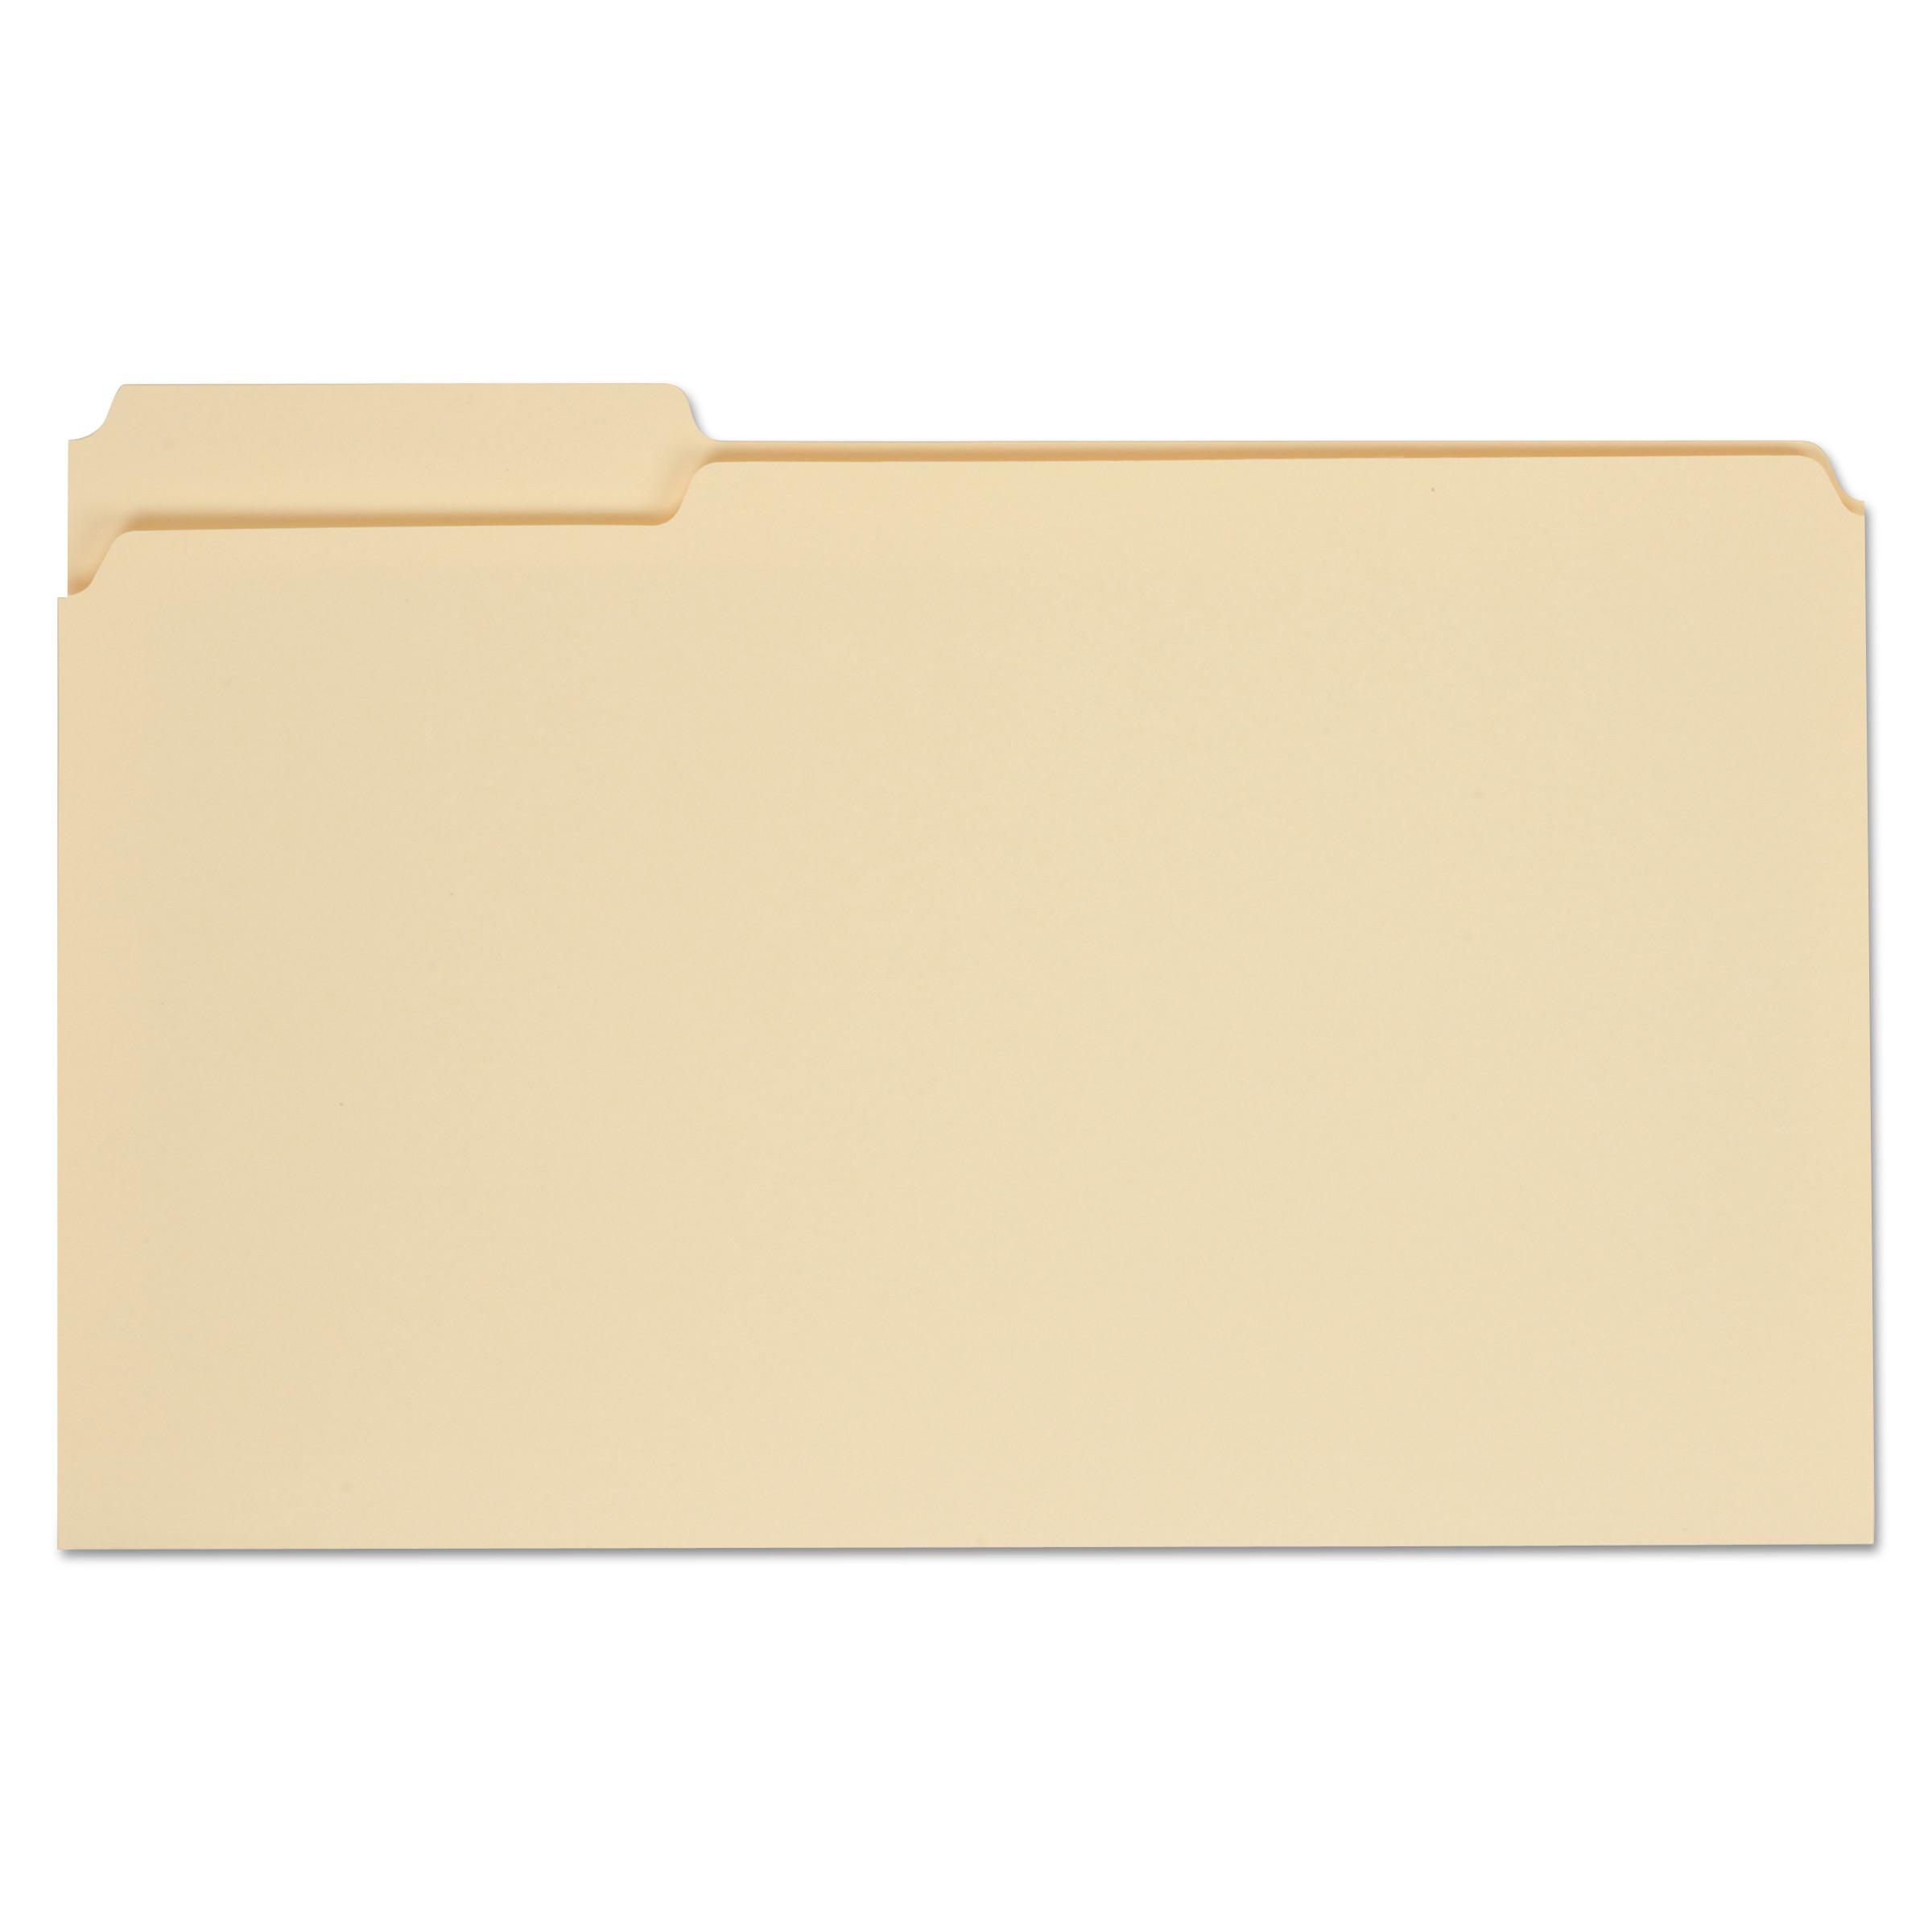 Top Tab Manila File Folders, 1/3-Cut Tabs, Assorted Positions, Legal Size, 11 pt. Manila, 100/Box